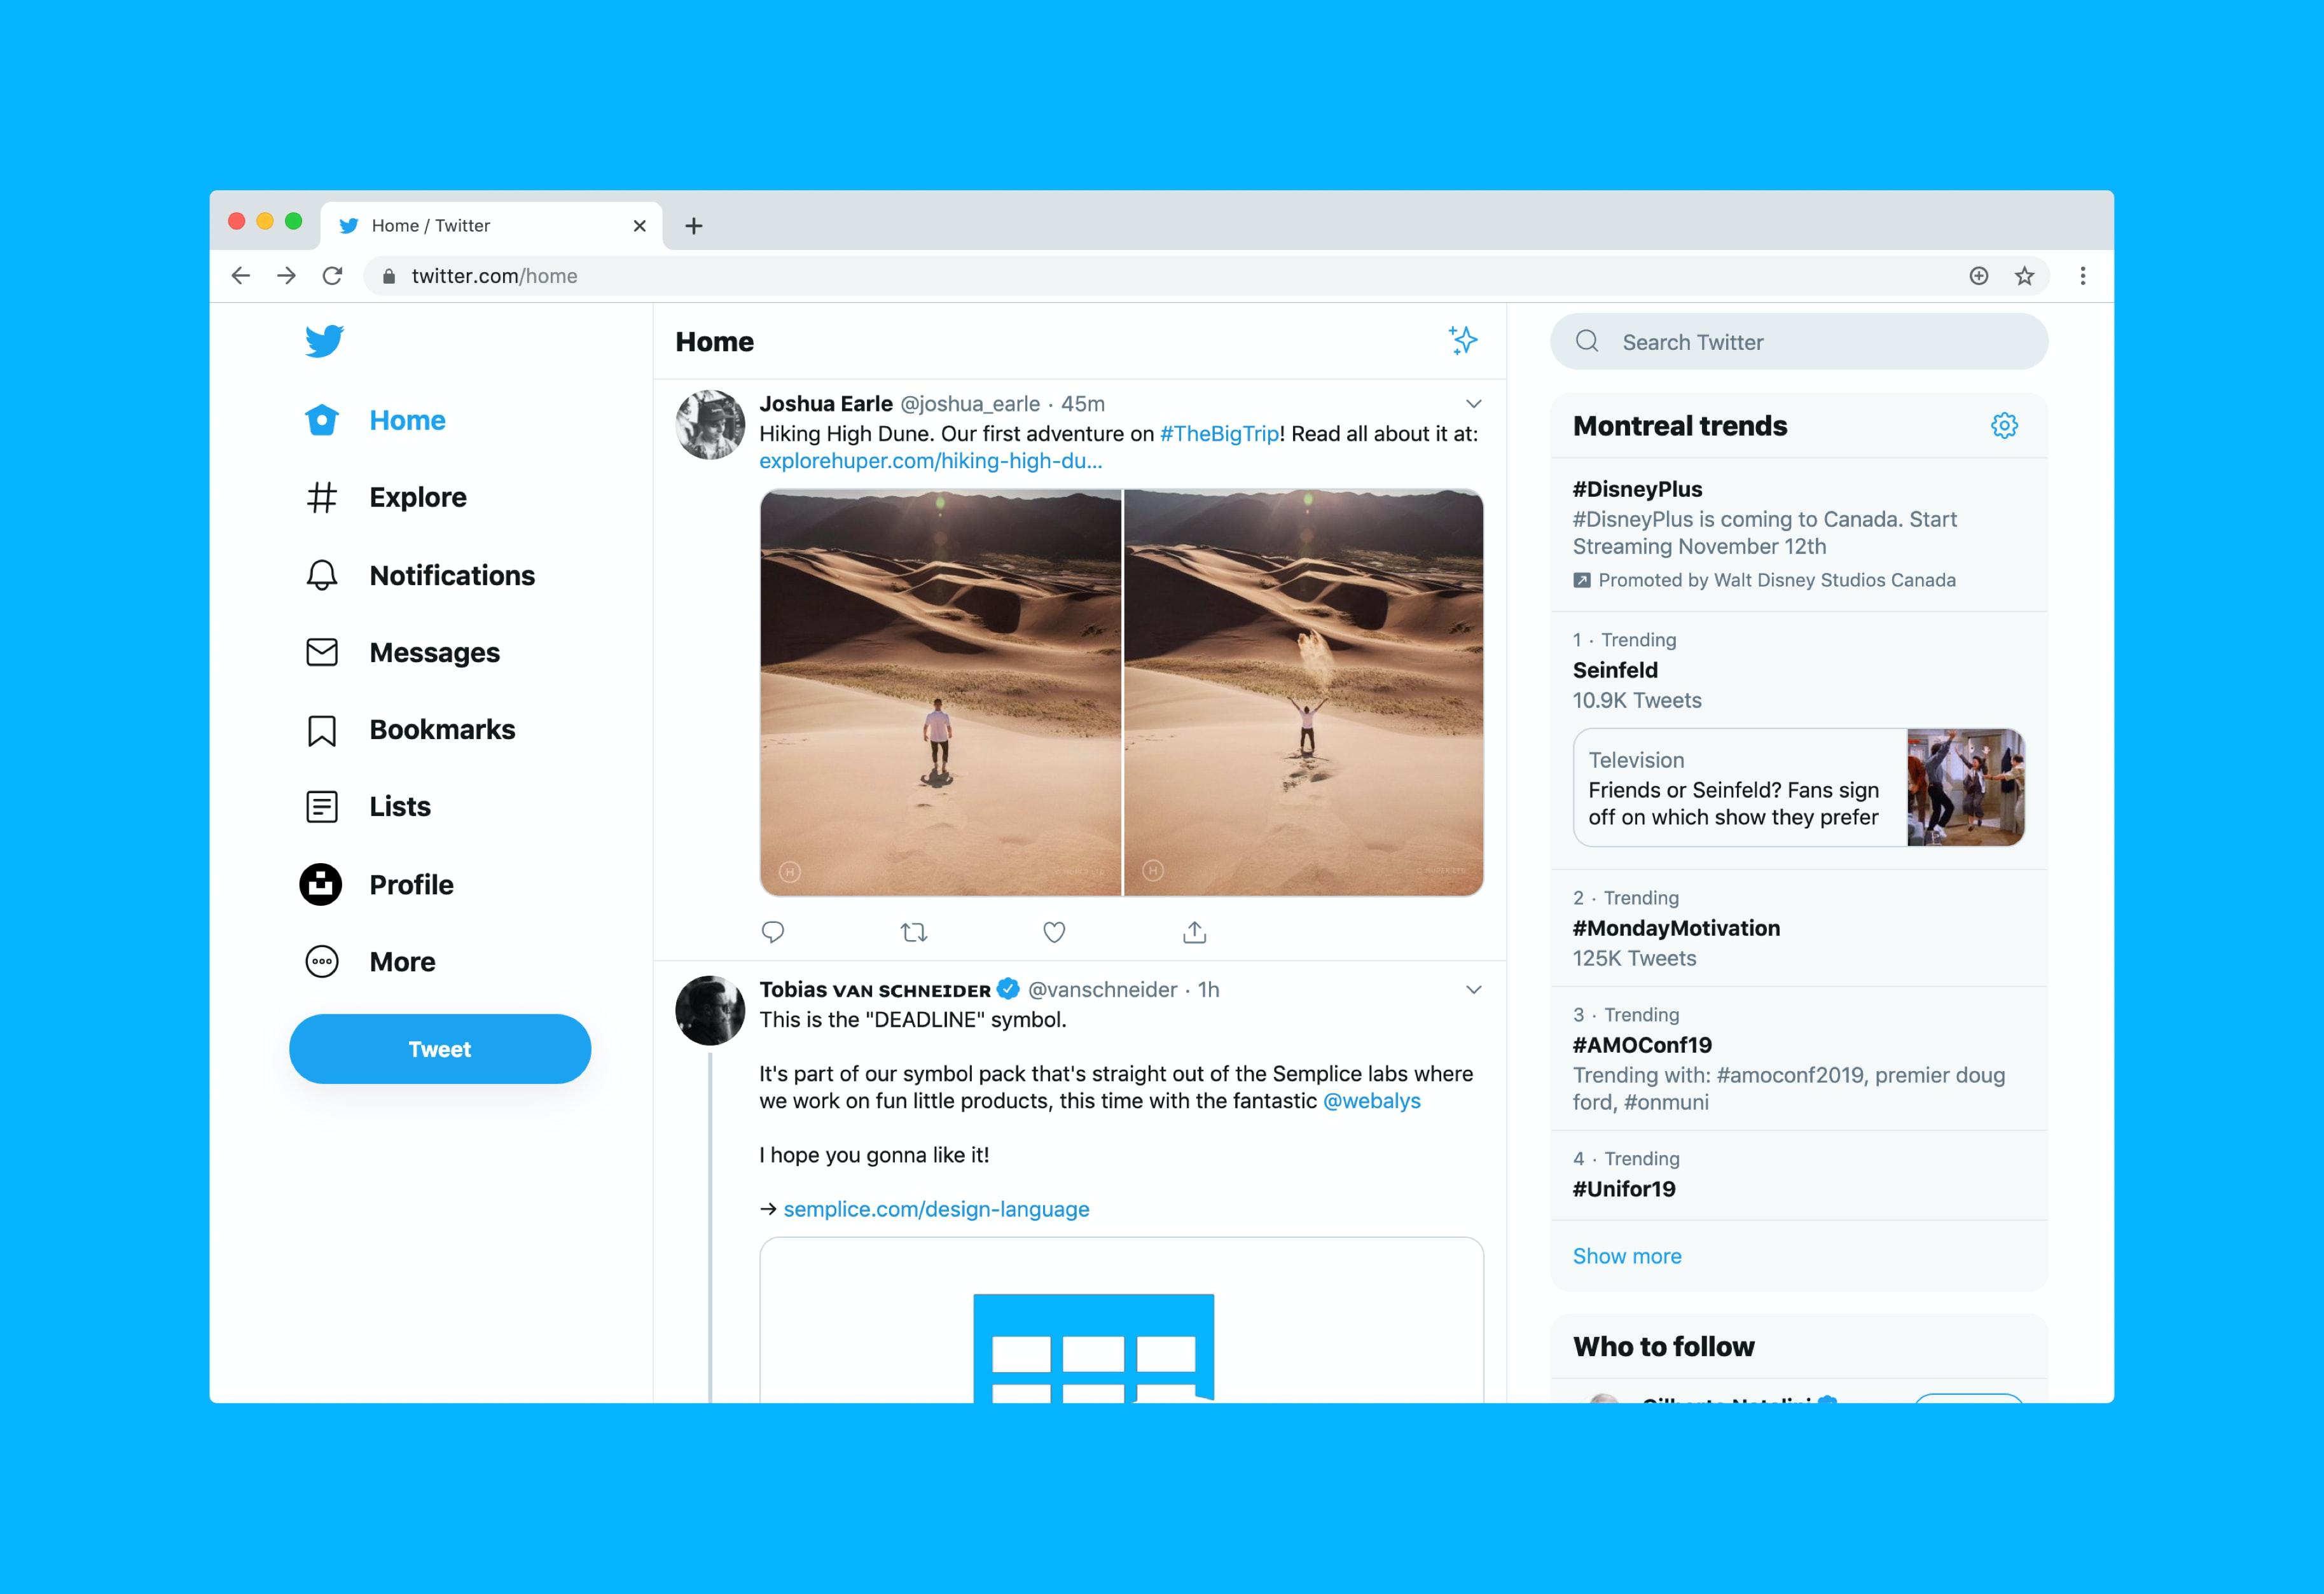 Twitterマーケティング-Twitter広告の特徴 イメージ画像